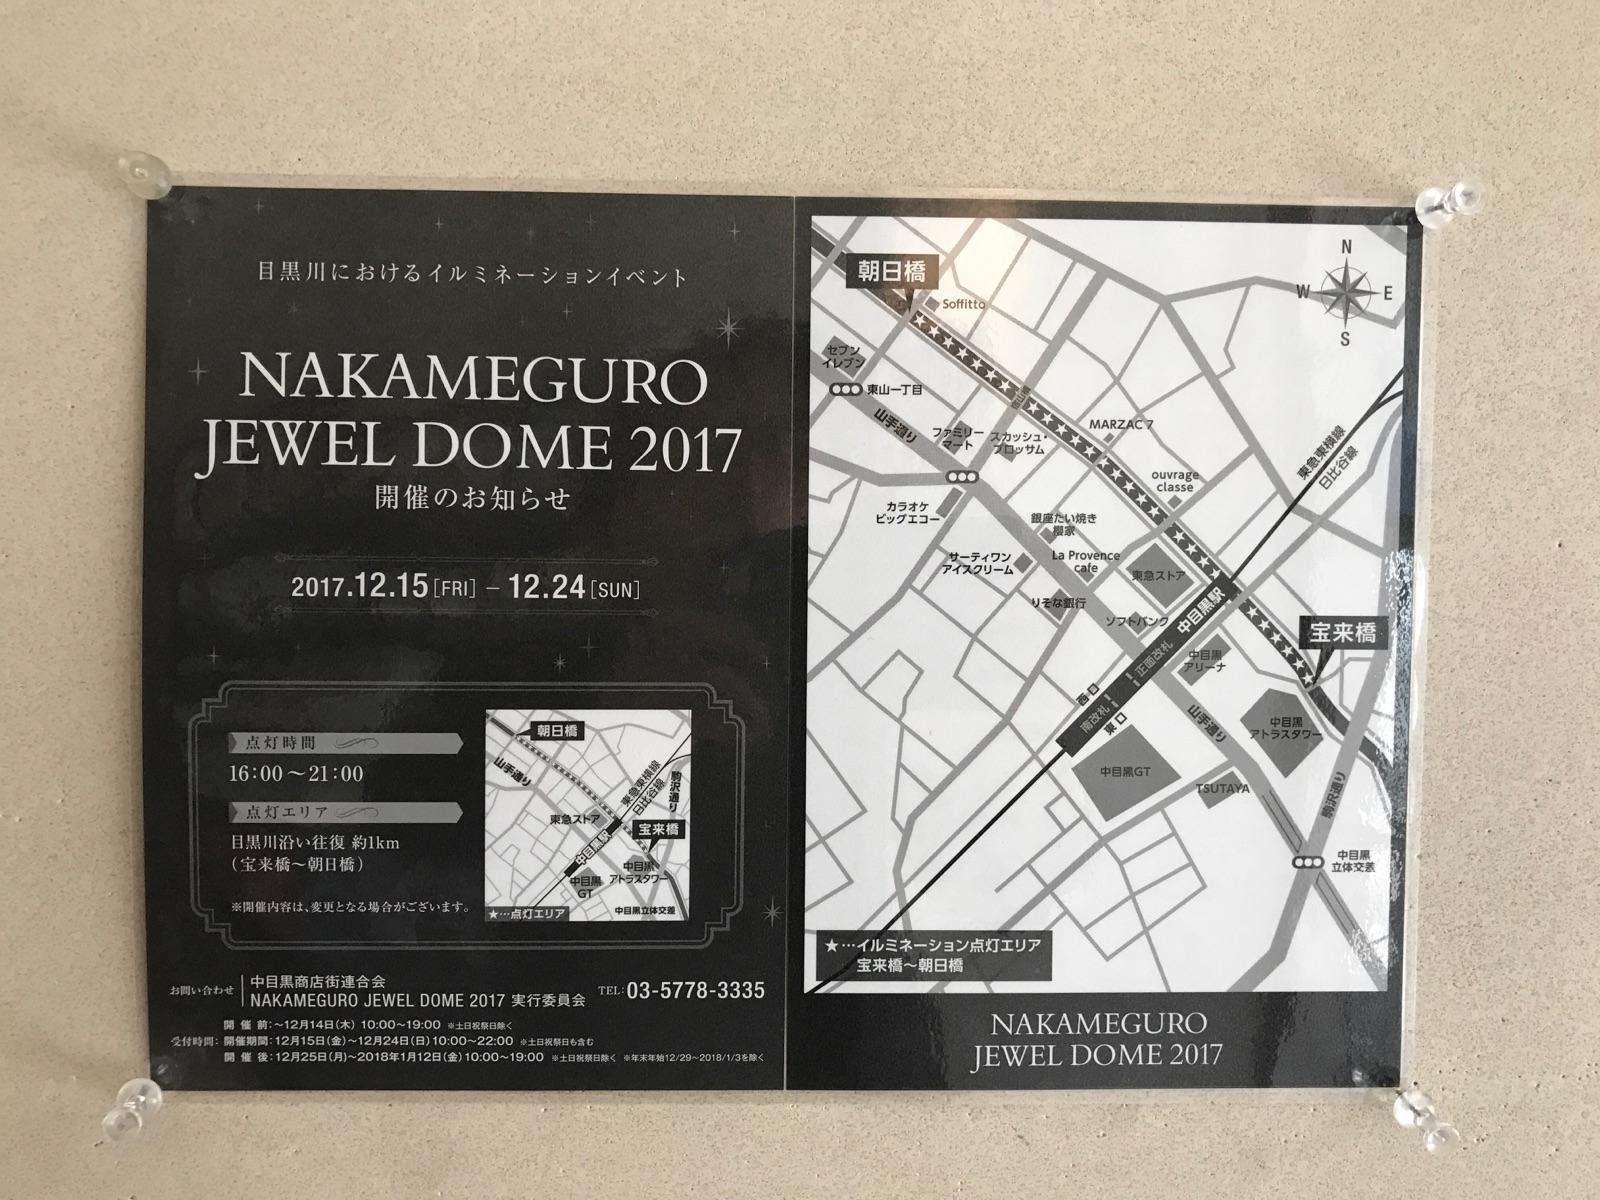 http://www.tokyustay.co.jp/hotel/YU/topics/e645daac3ab0863a5d1f8b7463a5c1757902cbfa.jpg